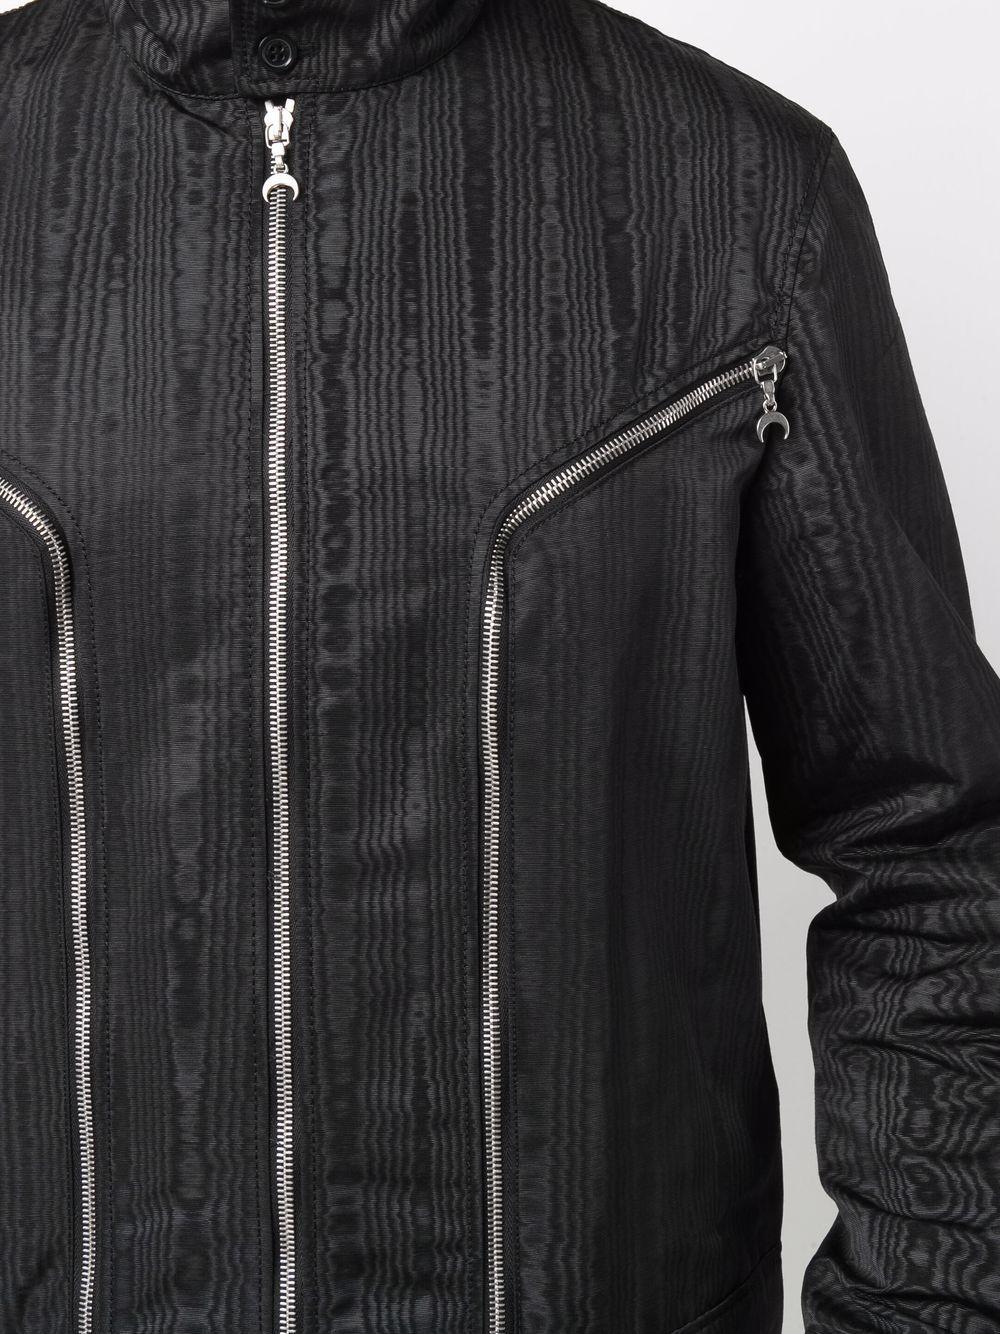 moire effect jacket man black MARINE SERRE | Jackets | J050FW21M00